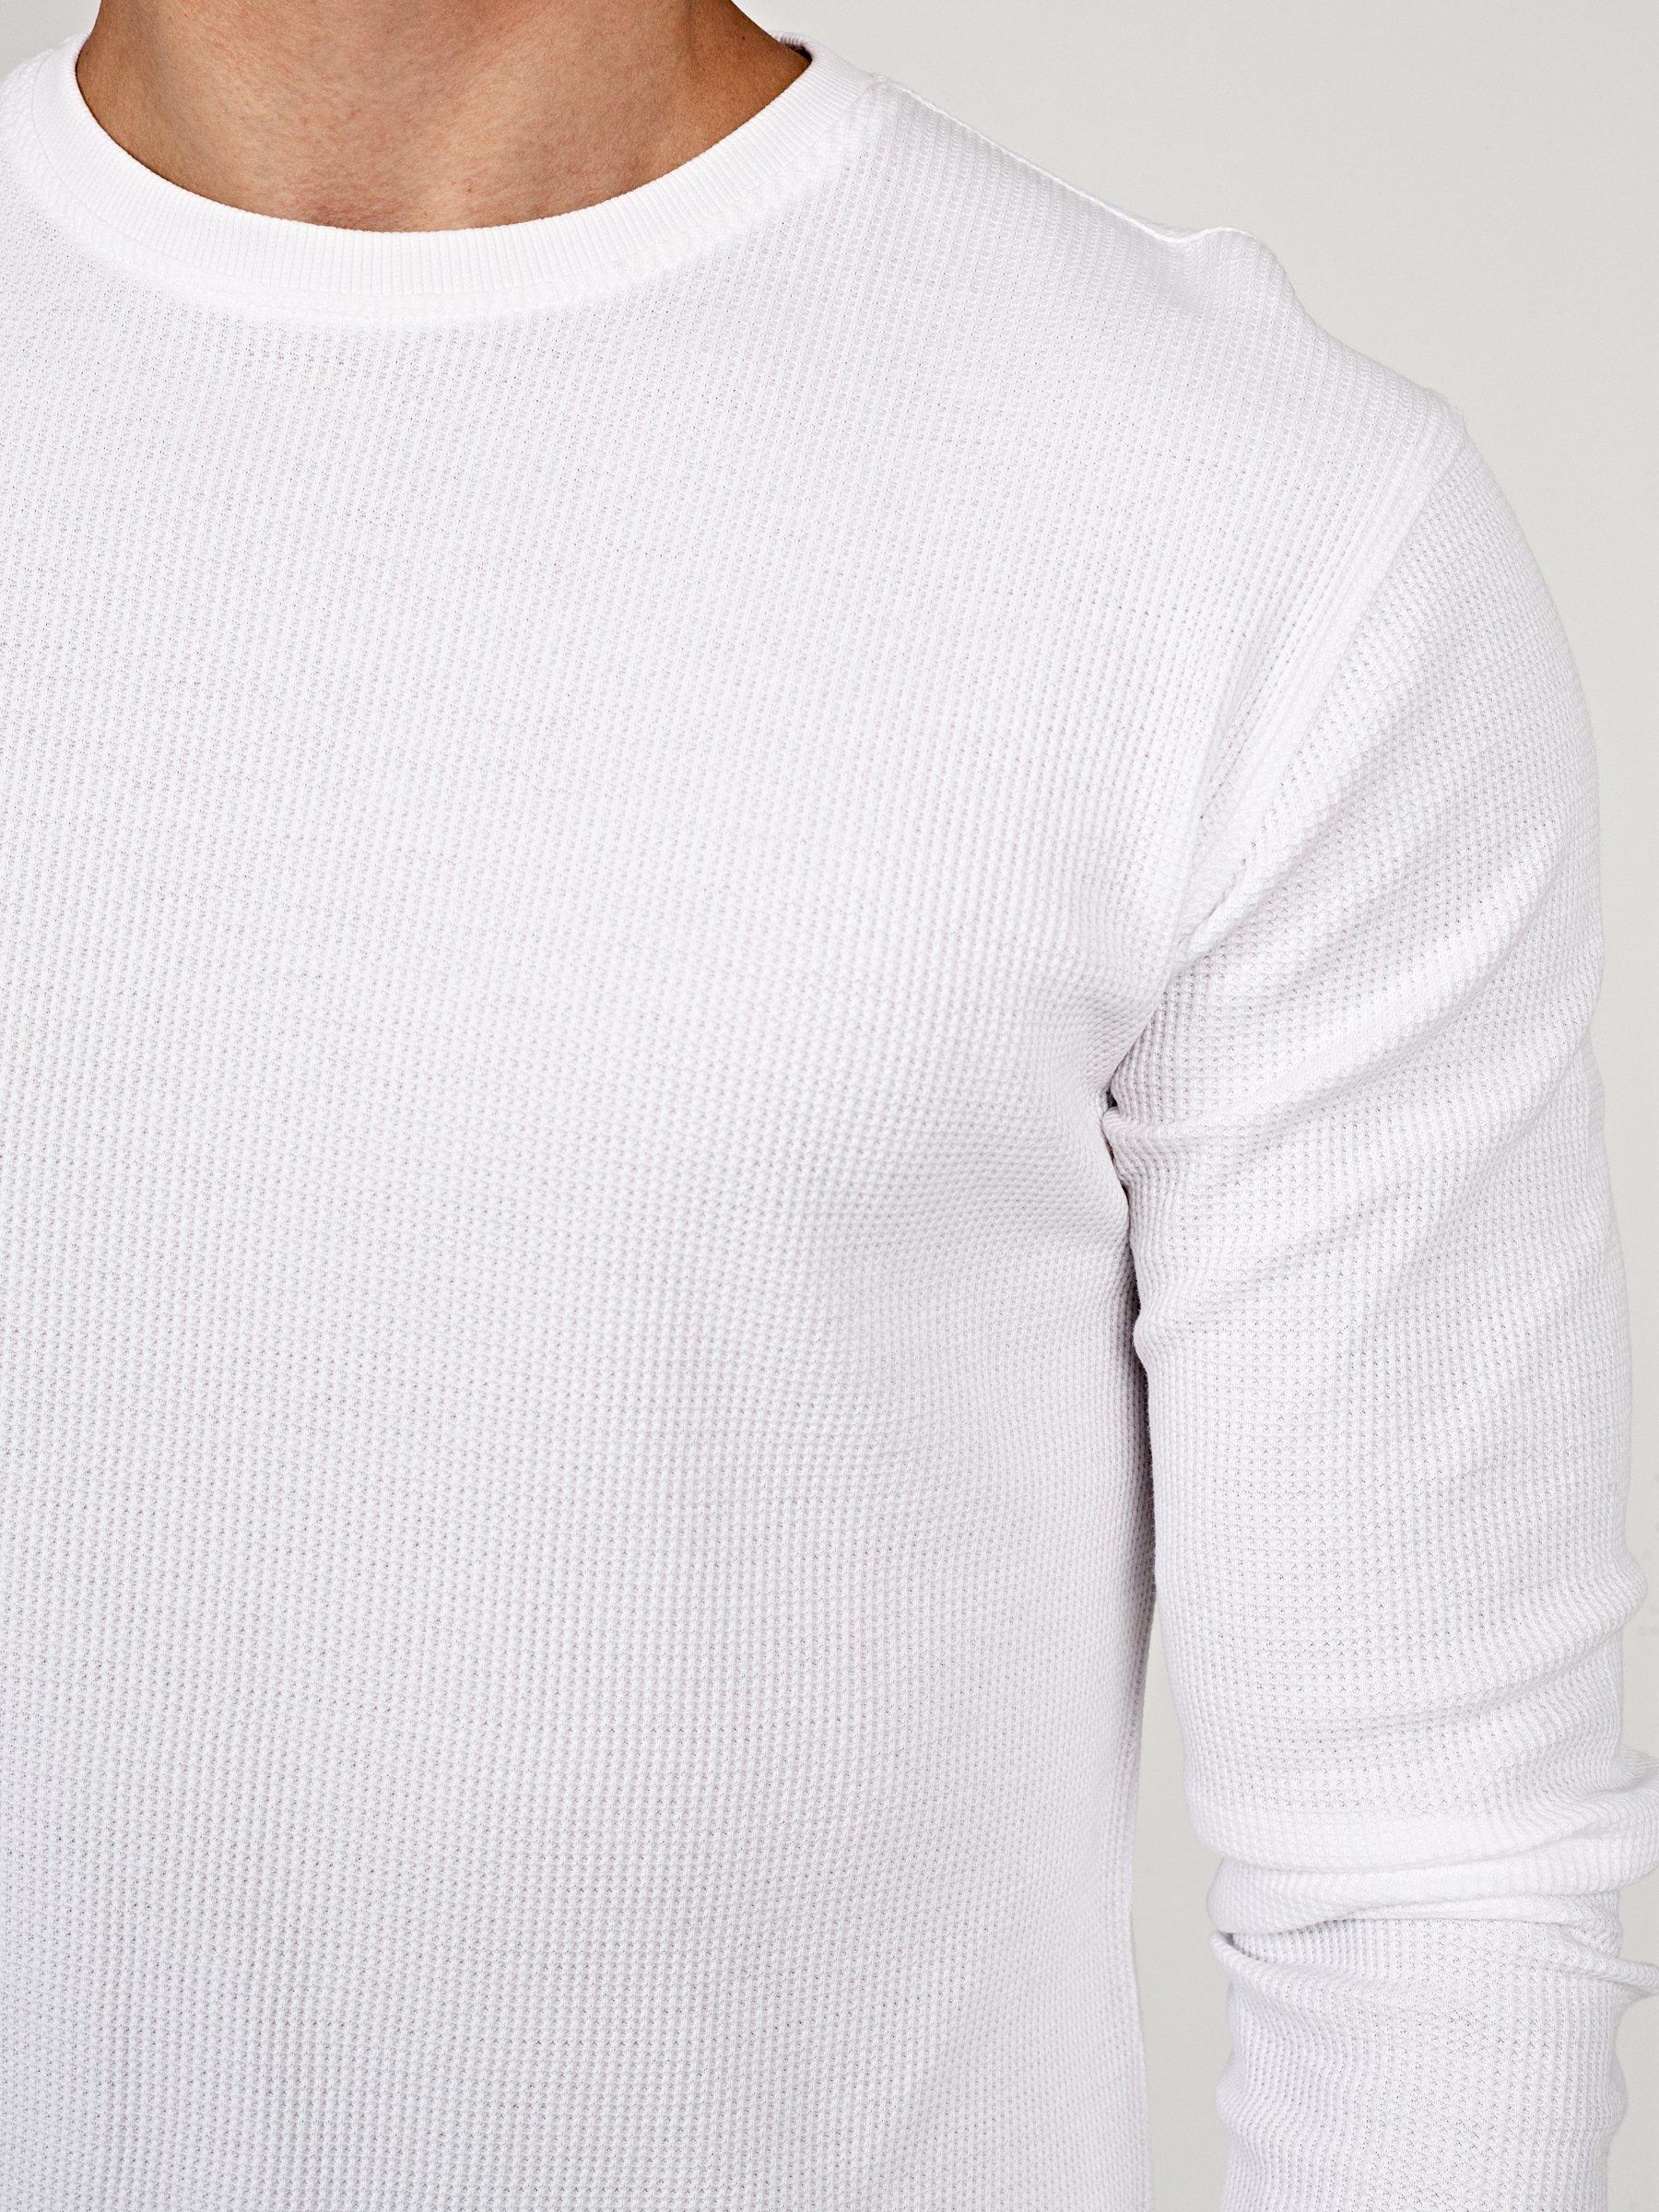 Basic Waffle Knit T Shirt Gate